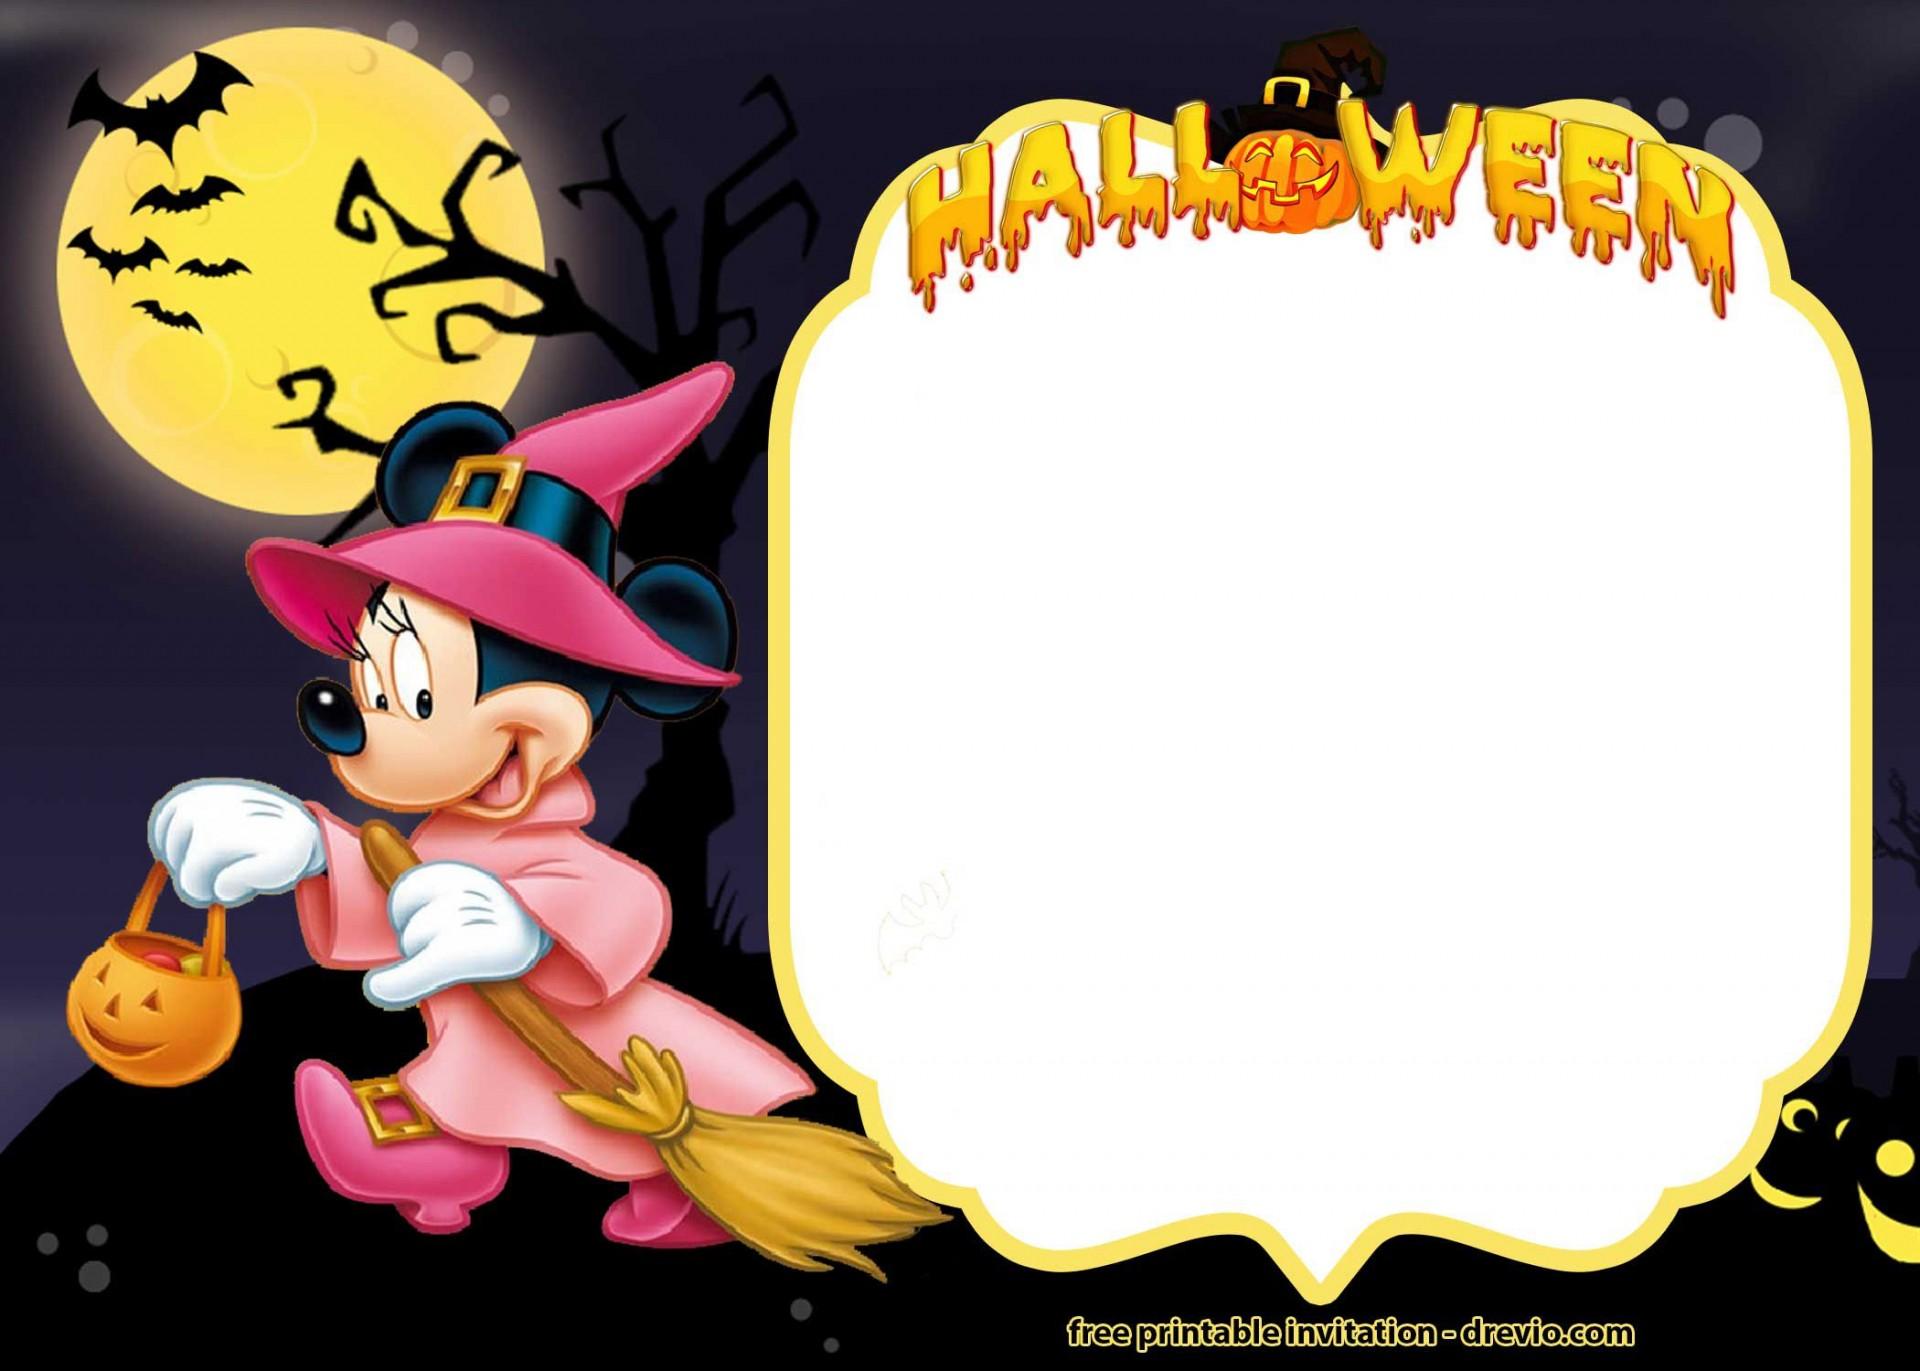 009 Excellent Free Halloween Invitation Template Idea  Templates Online Printable Birthday Party Wedding1920